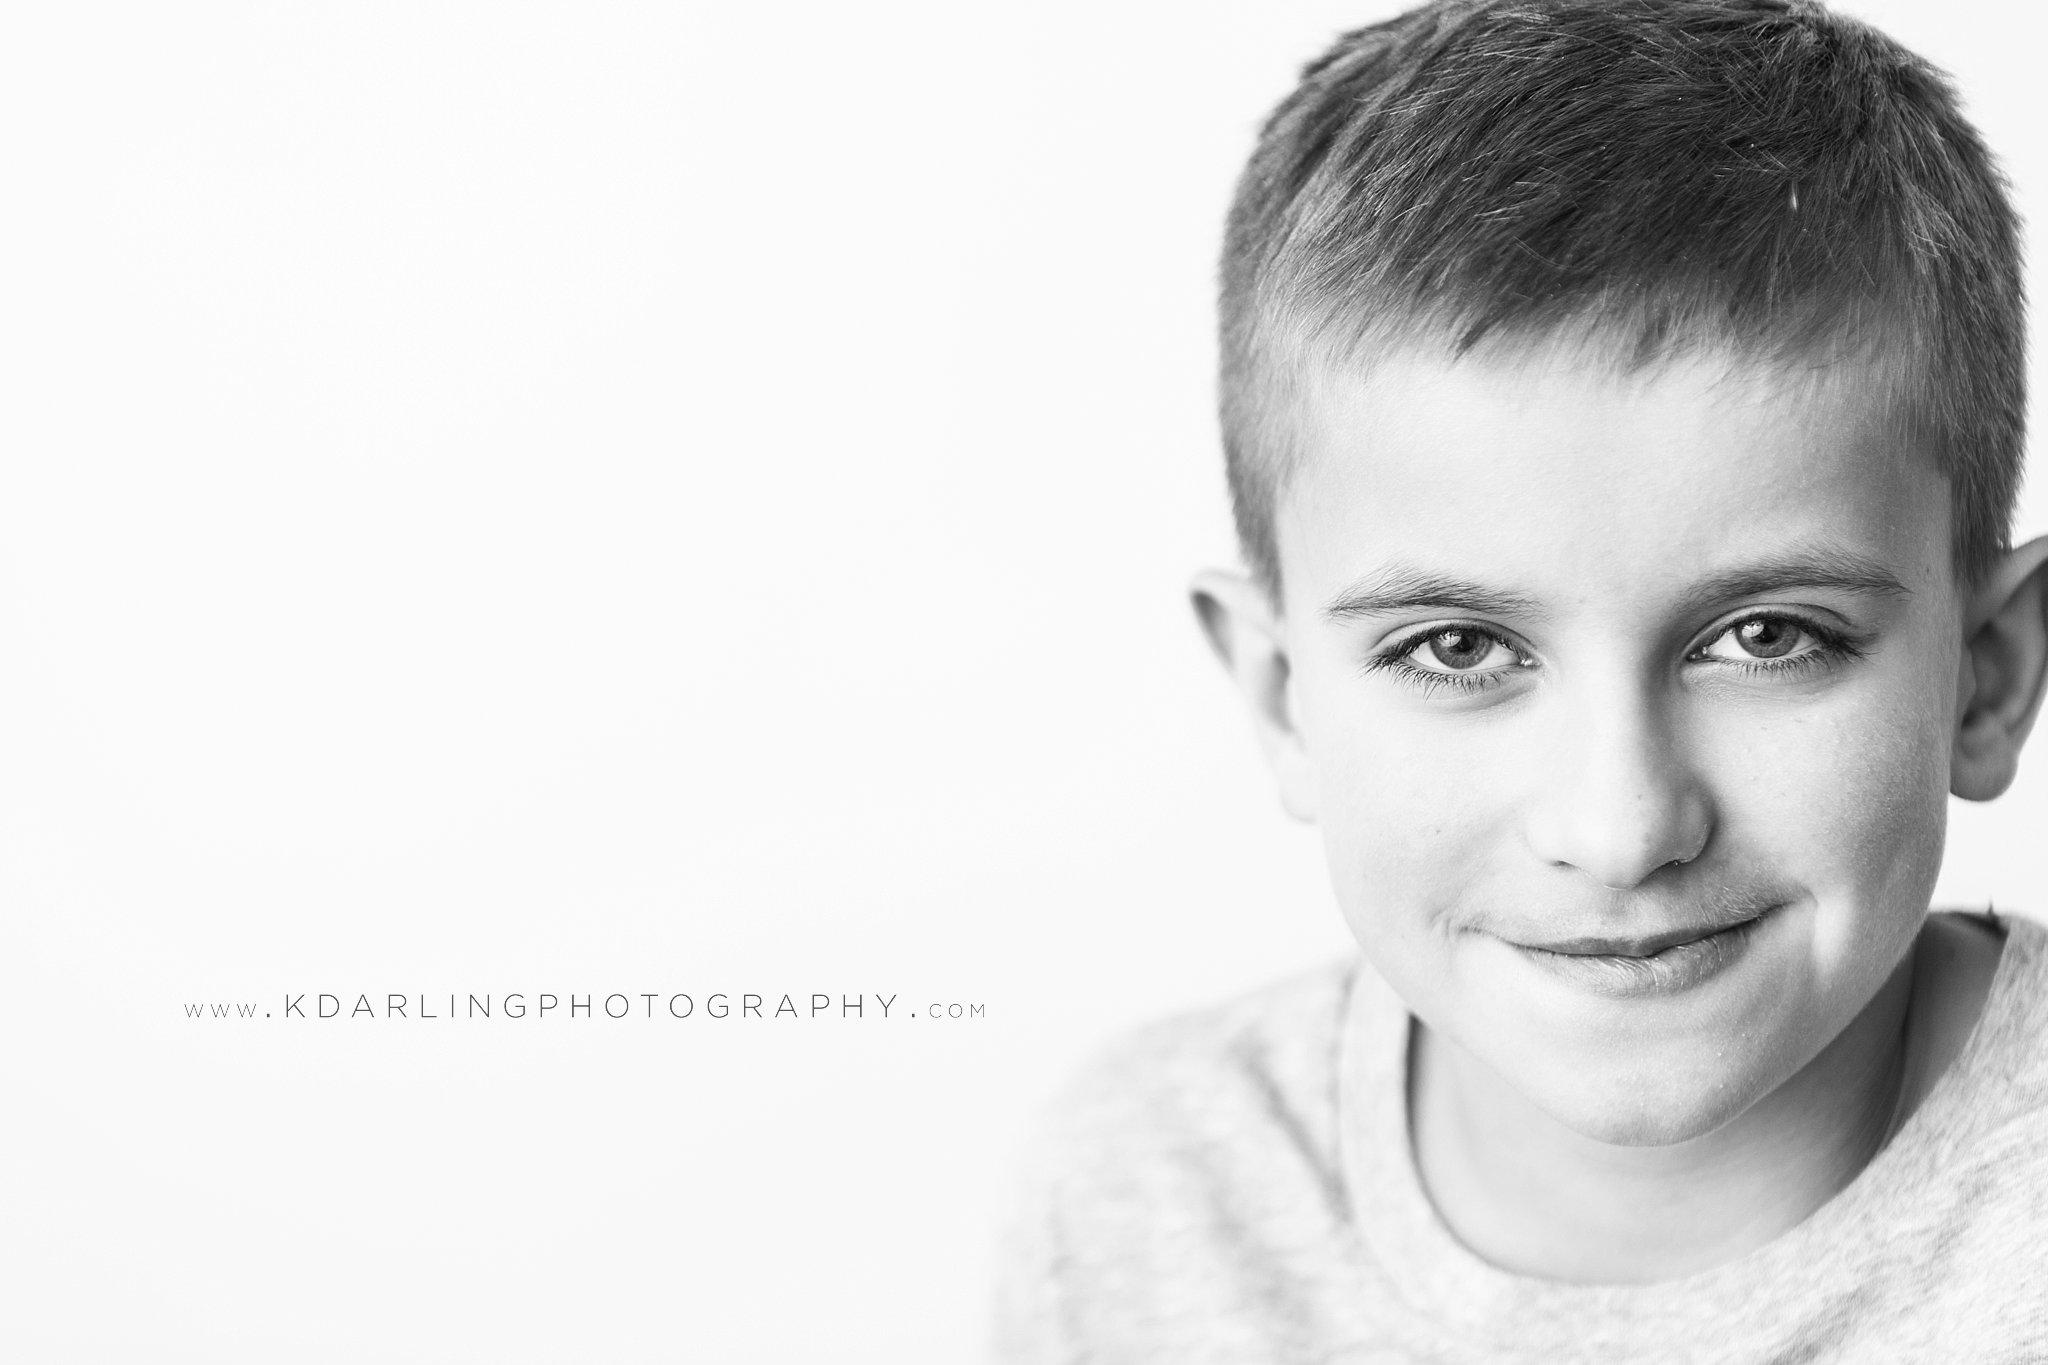 Child-Photographer-portraits-Champaign-County-IL-Fisher-Studio-Darling_0176.jpg